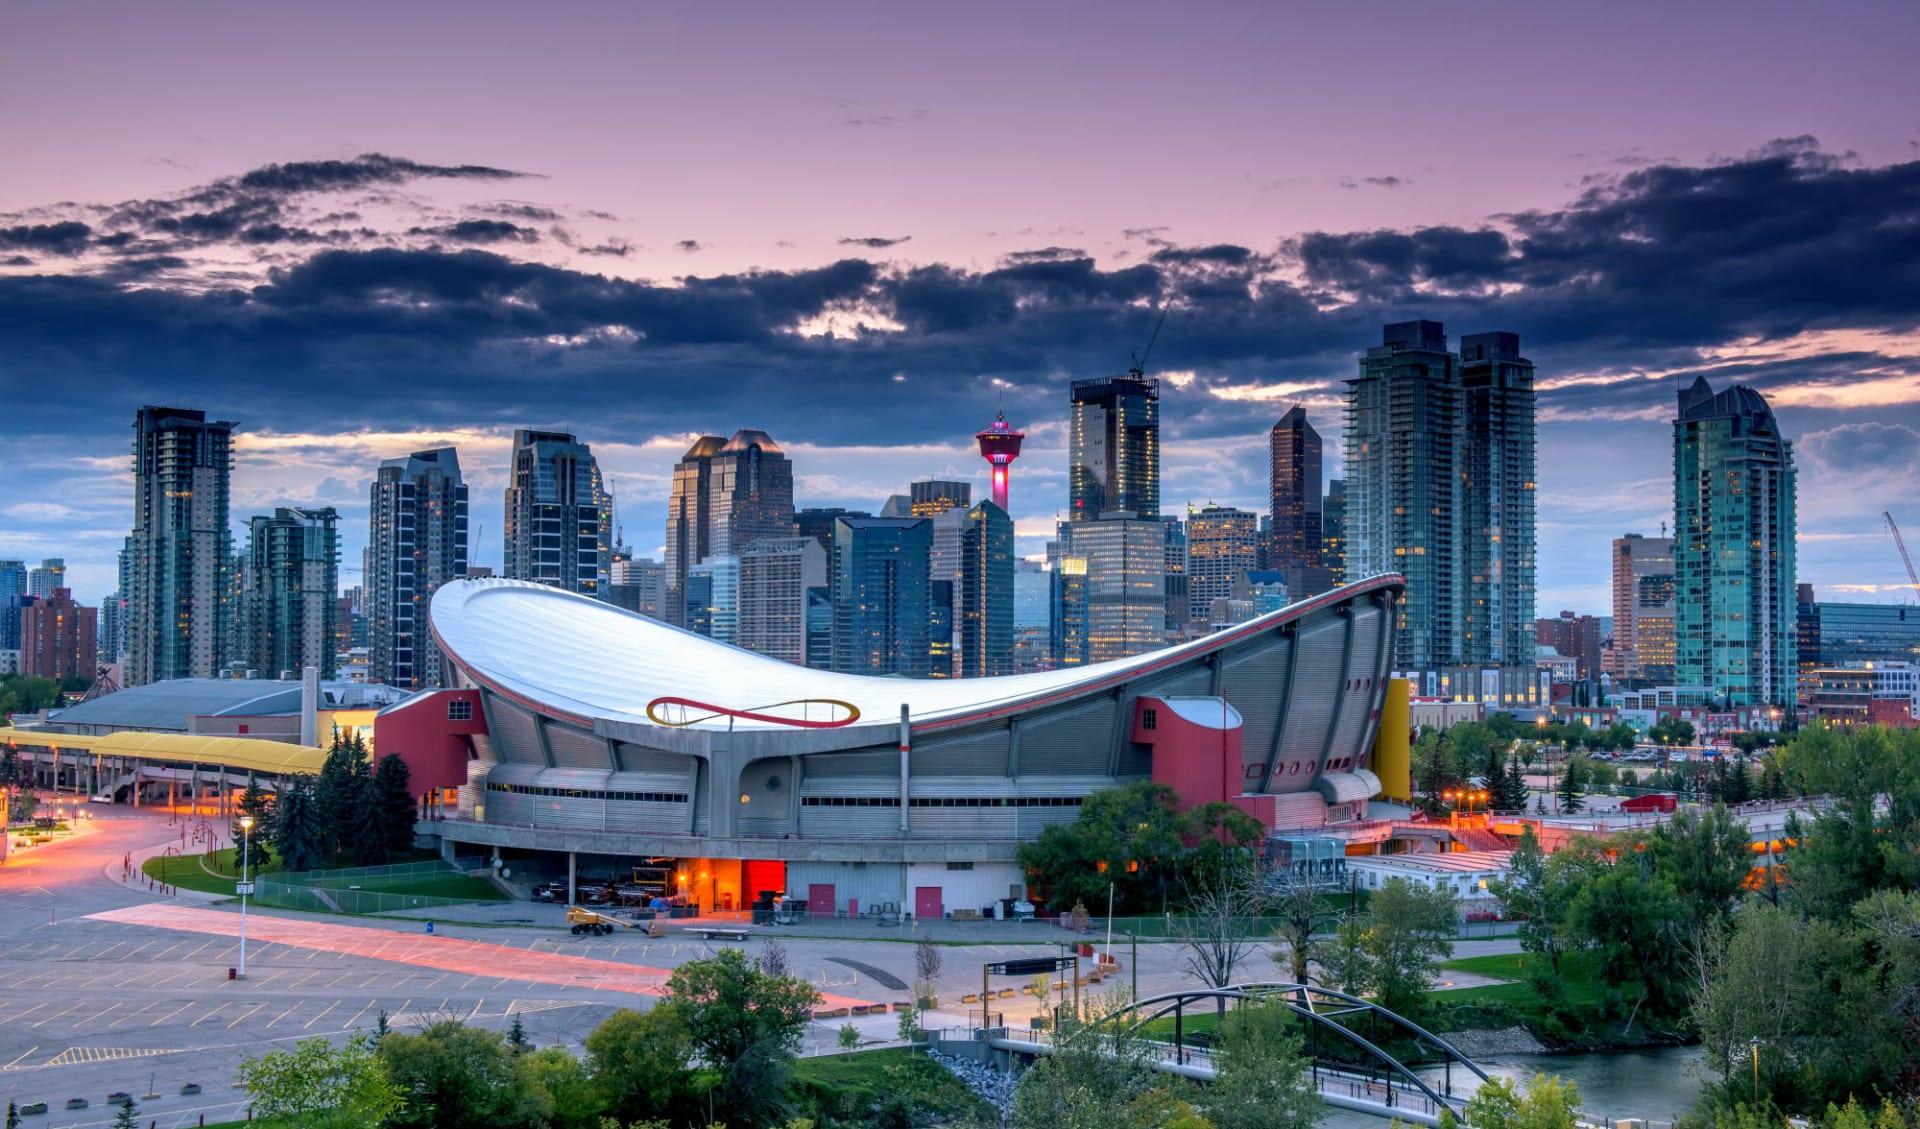 Wanderrundreise von Lodge zu Lodge ab Calgary: Kanada - Calgary Alberta - Skyline by Night